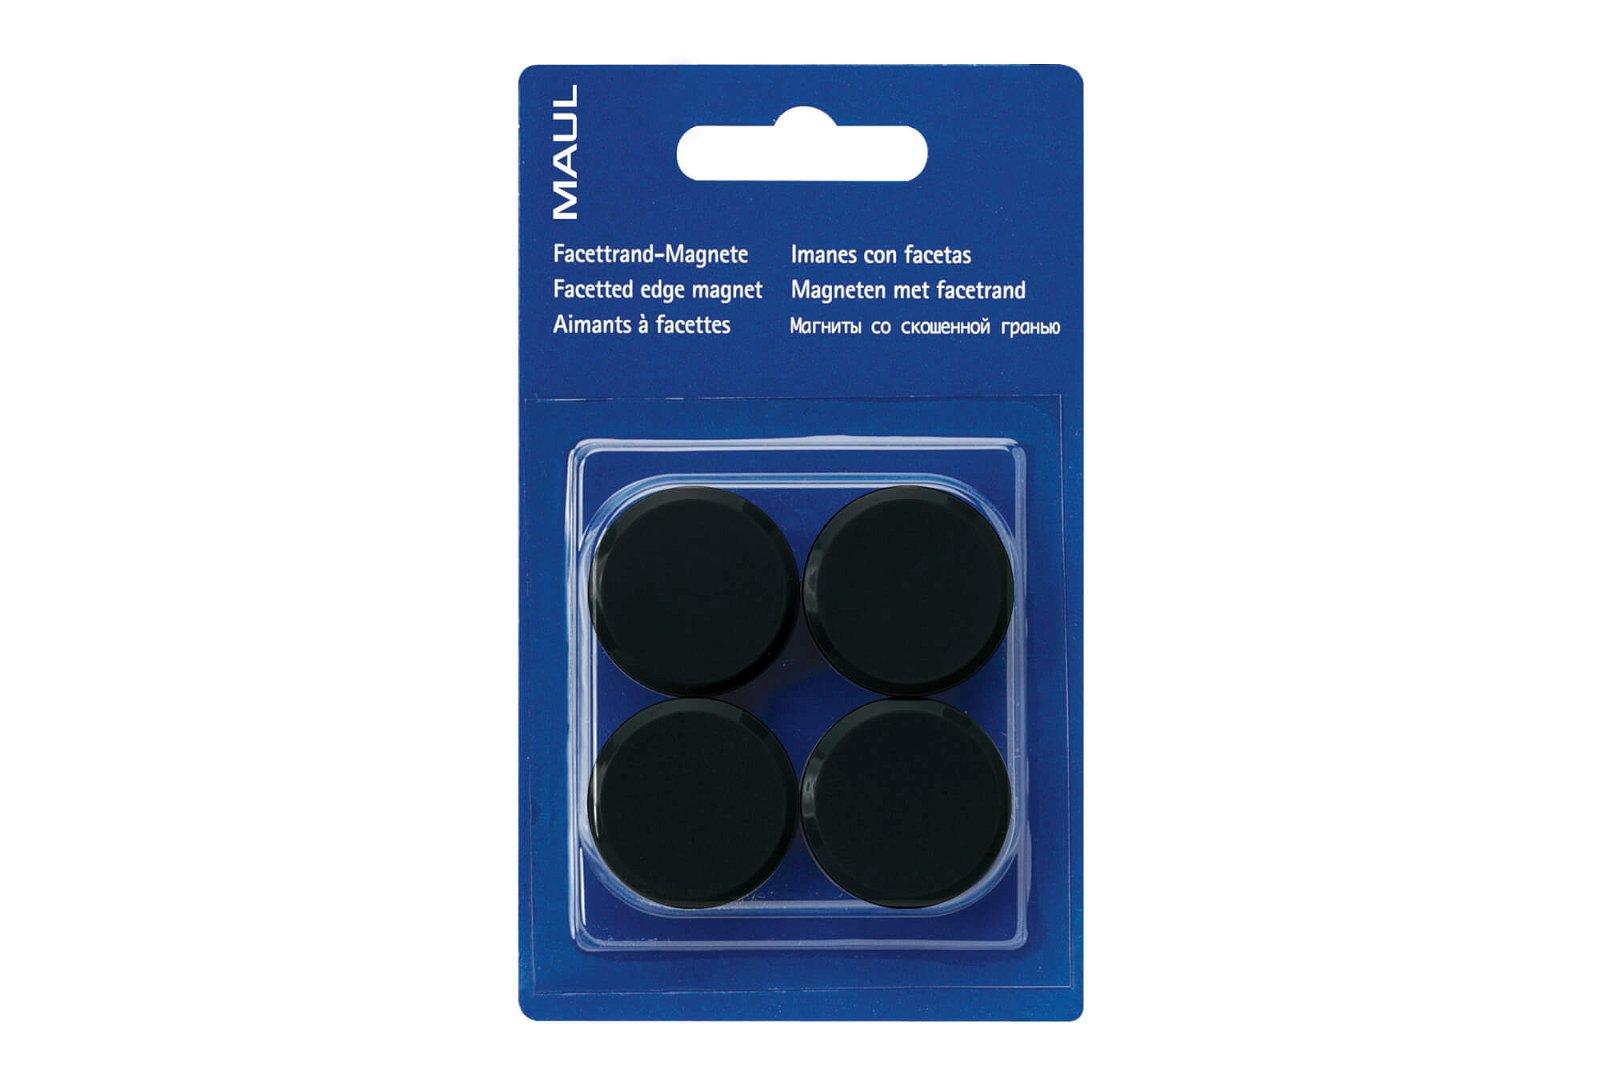 Facetterand-Magnet MAULpro SB Ø 30 mm, 0,6 kg, 4 St./Set, schwarz